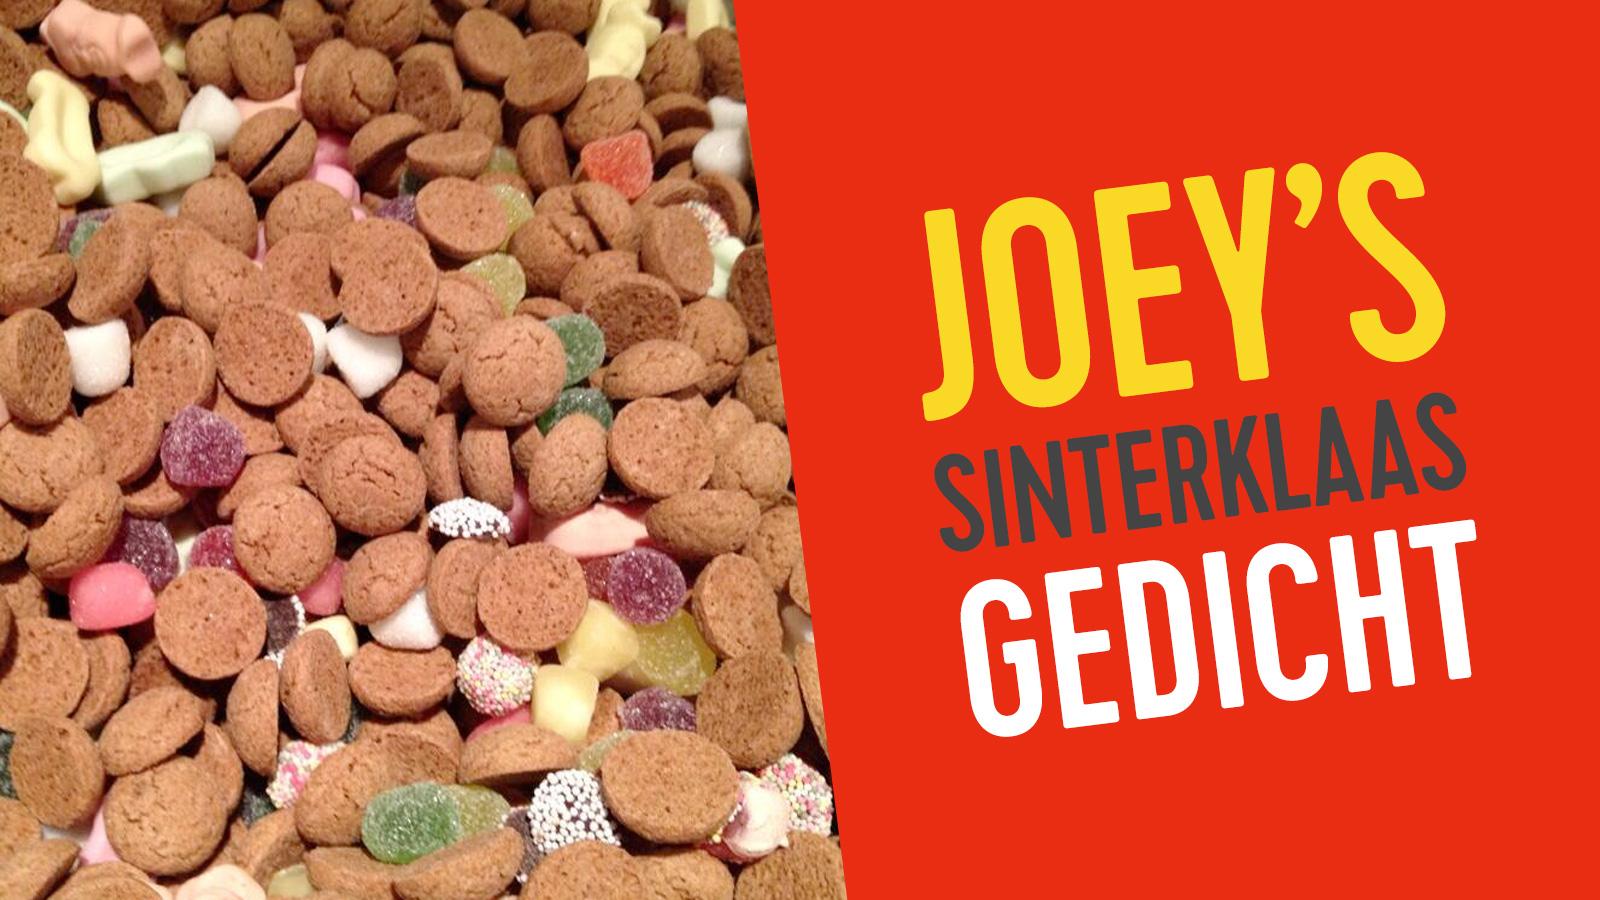 Joeythumb